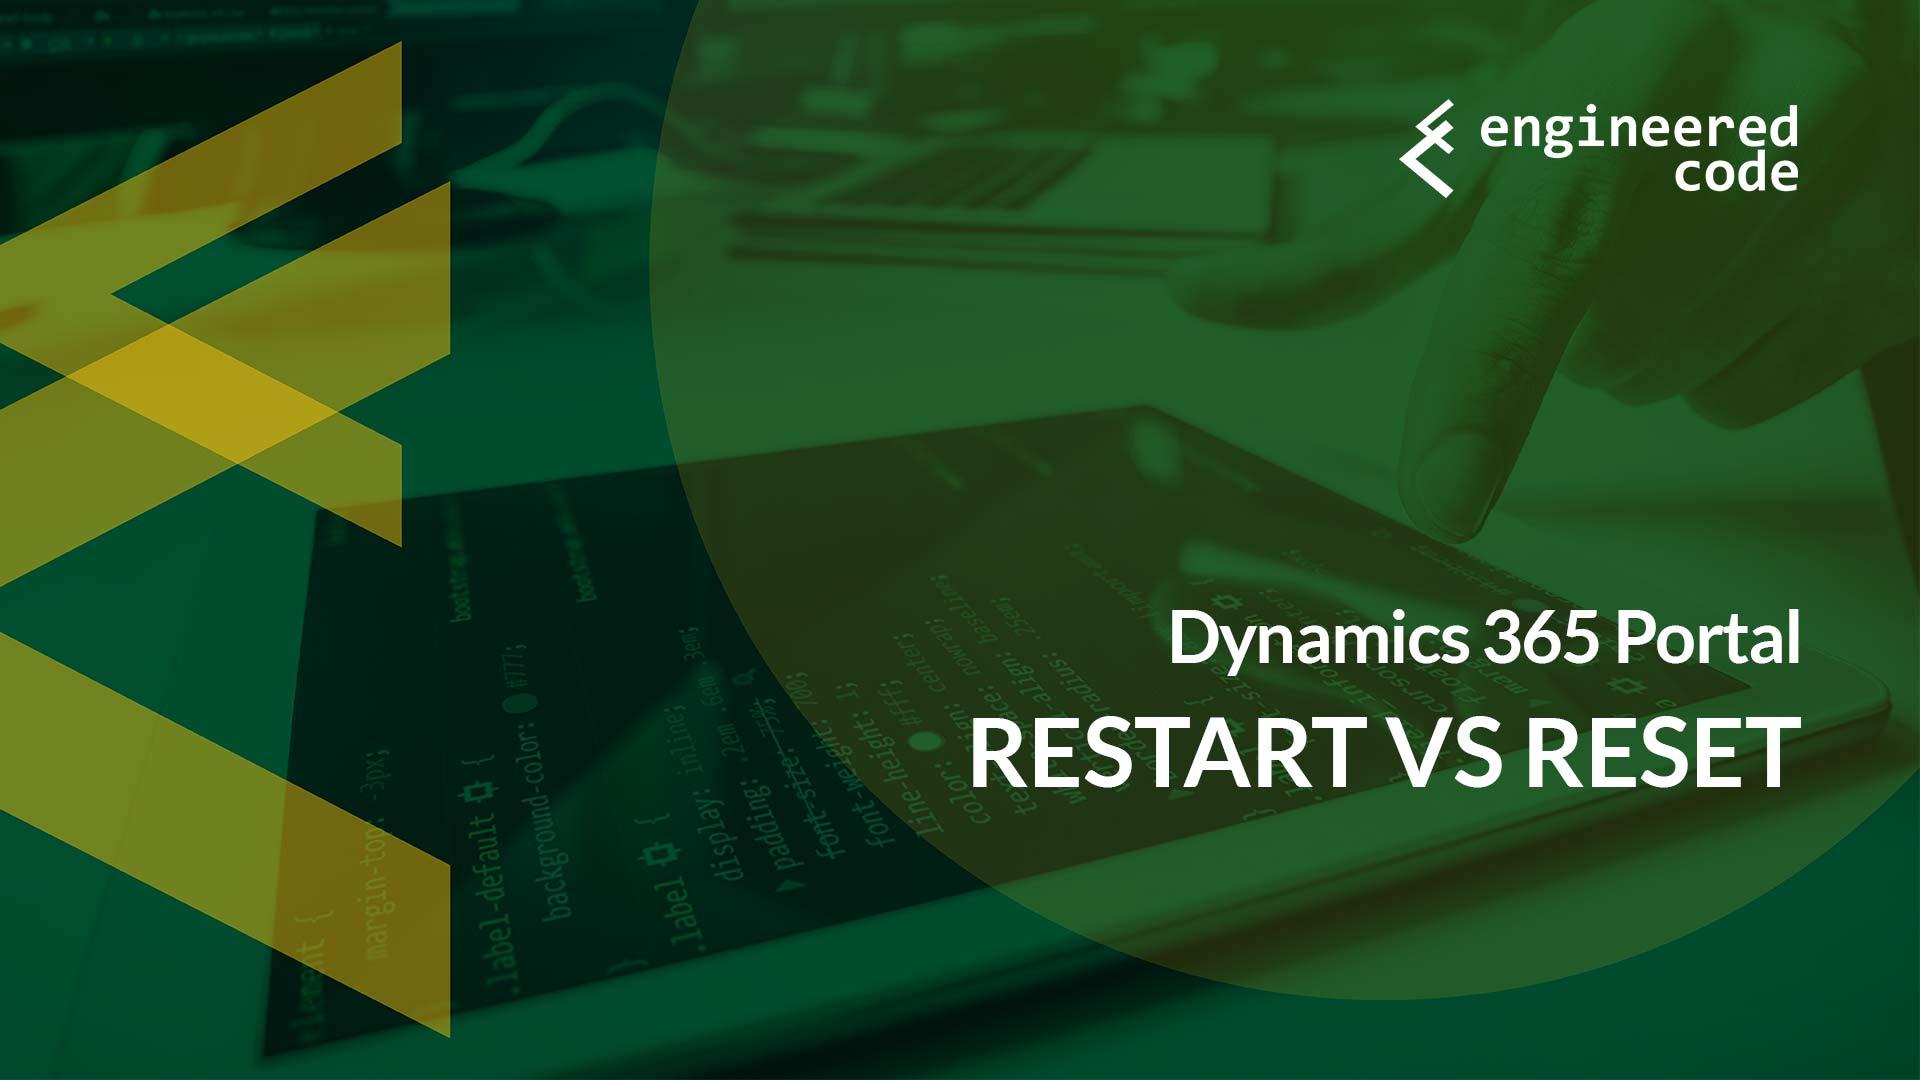 Dynamics 365 Portal: Restart vs Reset - Microsoft Dynamics 365 Community